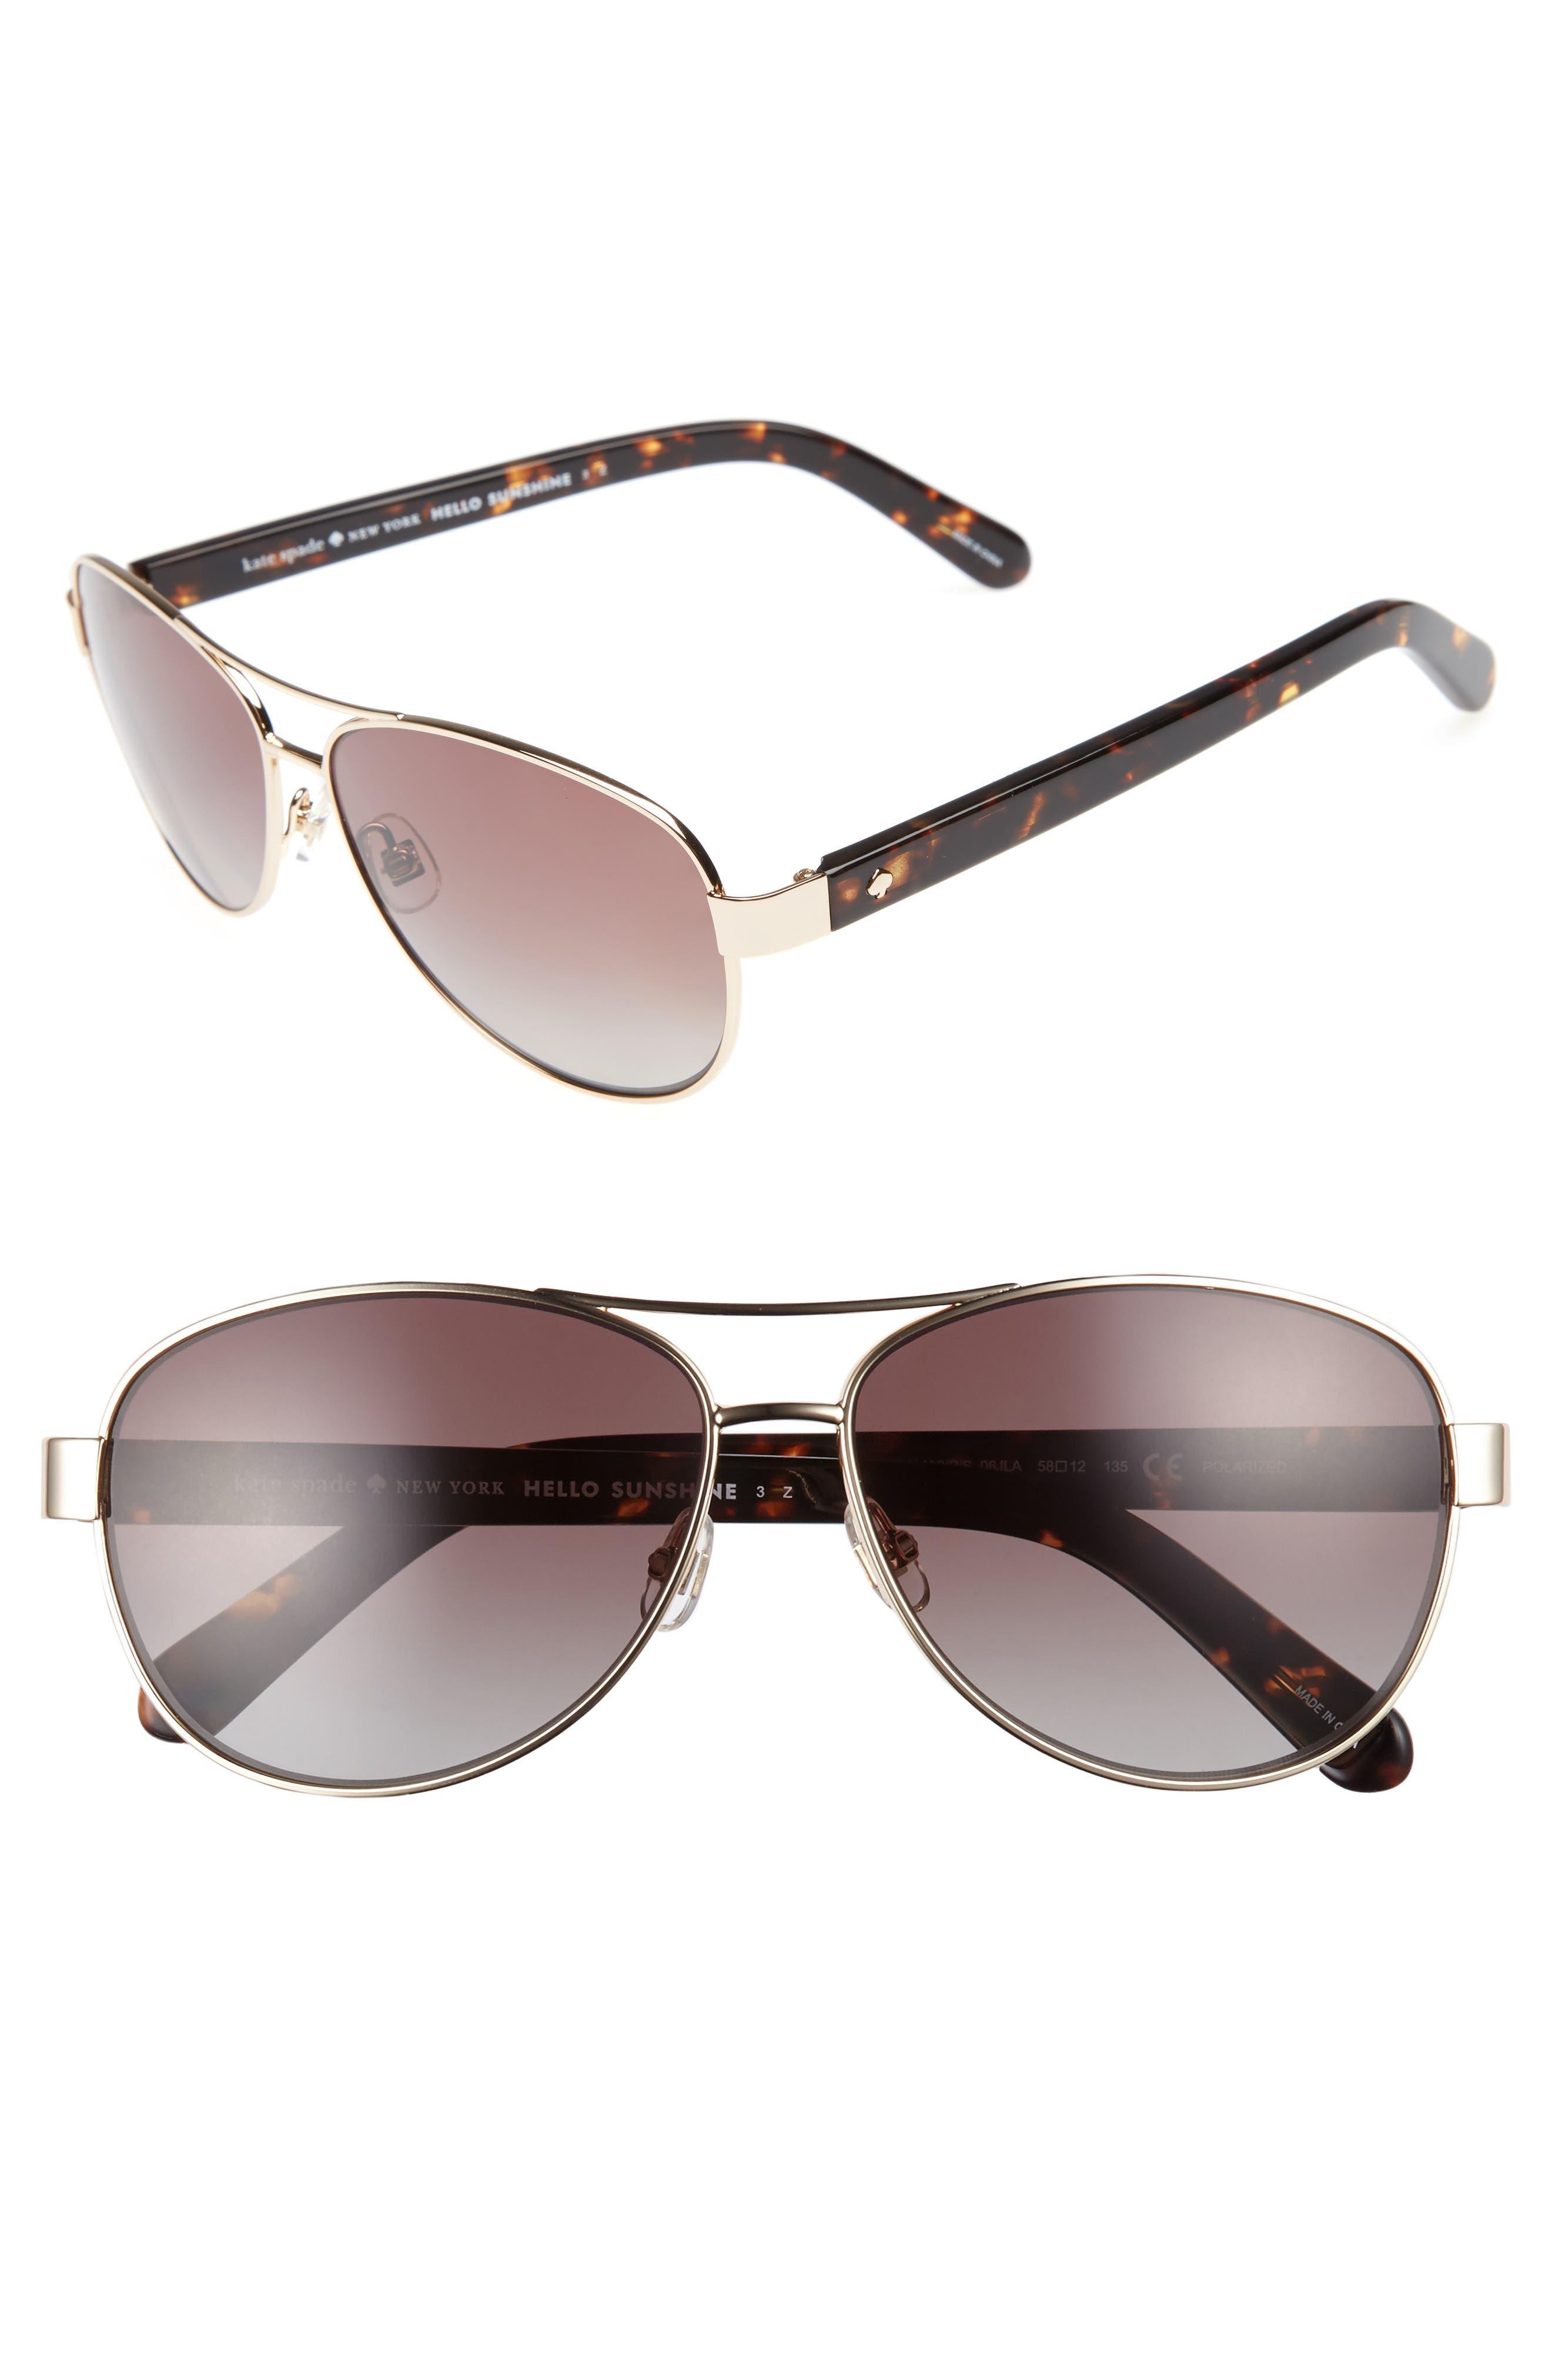 Alternate Image 1 Selected - kate spade new york 'dalia' 58mm polarized aviator sunglasses